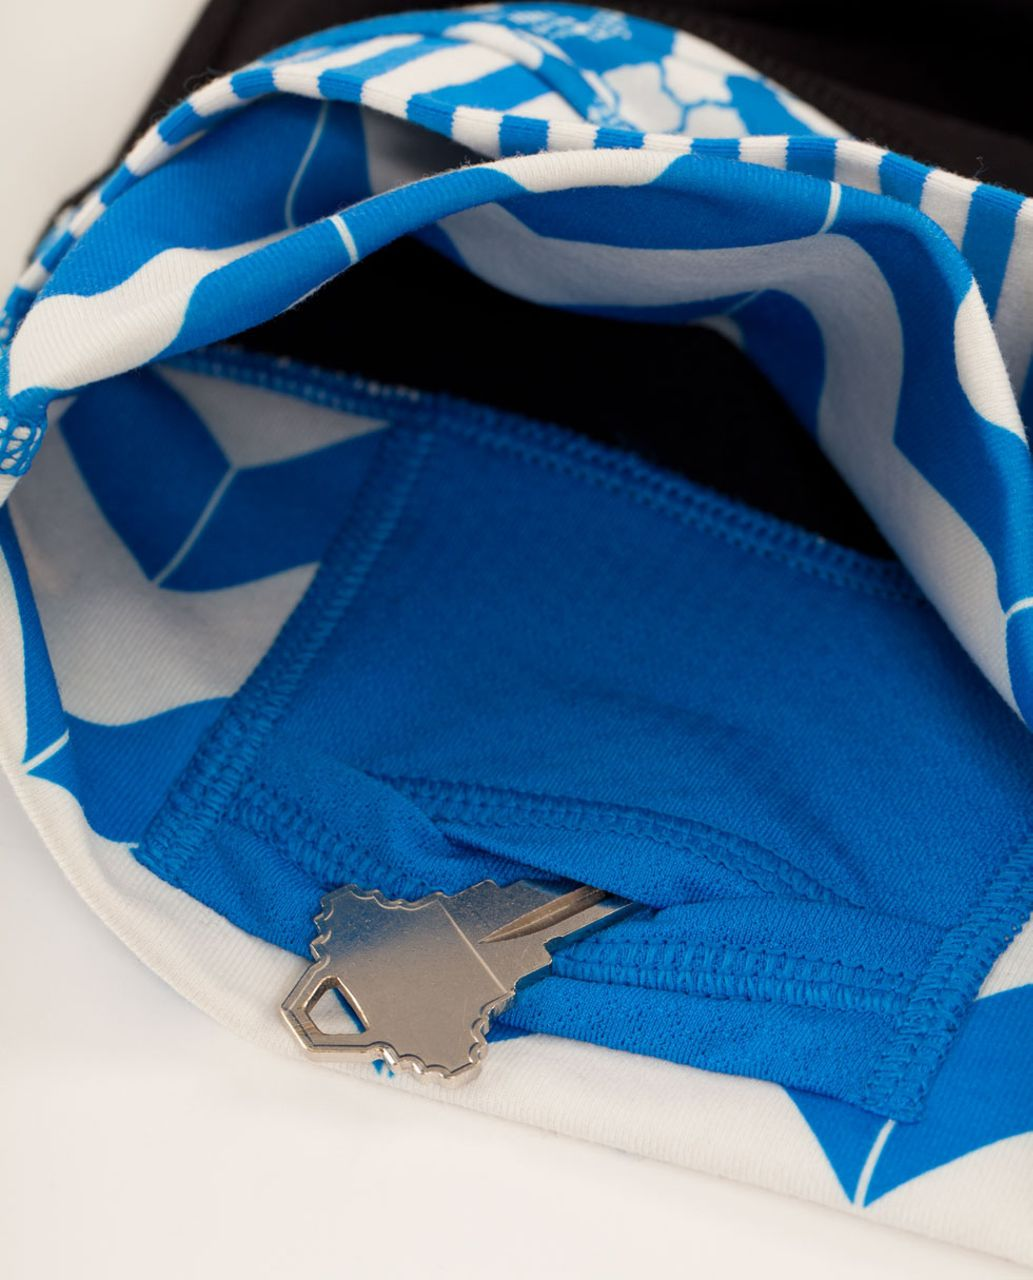 Lululemon Astro Pant (Regular) - Black / Arrow Chevron Polar Cream Beaming Blue / Classic Stripe Polar Cream Beaming Blue